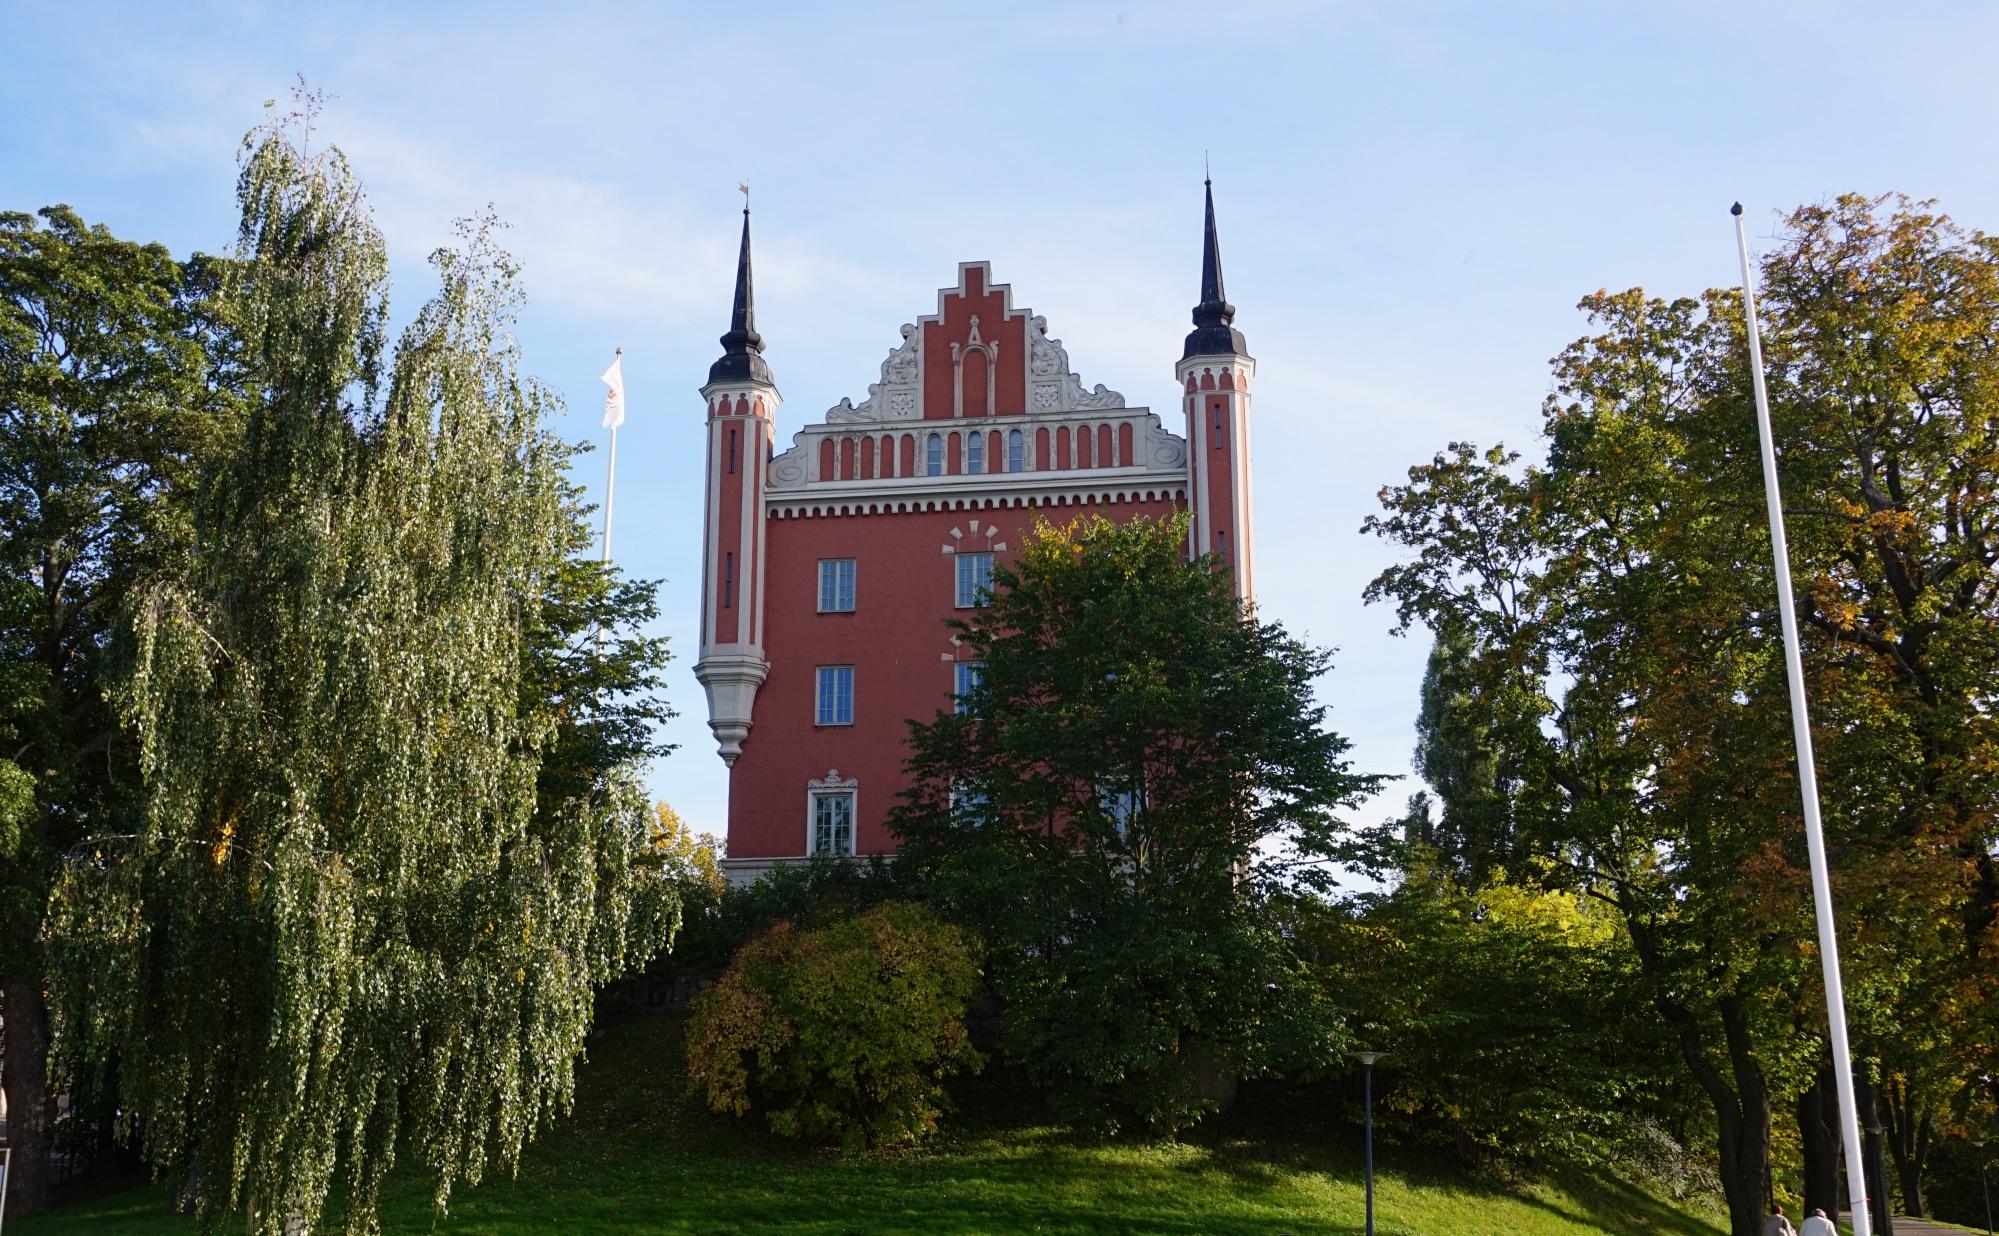 3-jours-a-stockholm-49